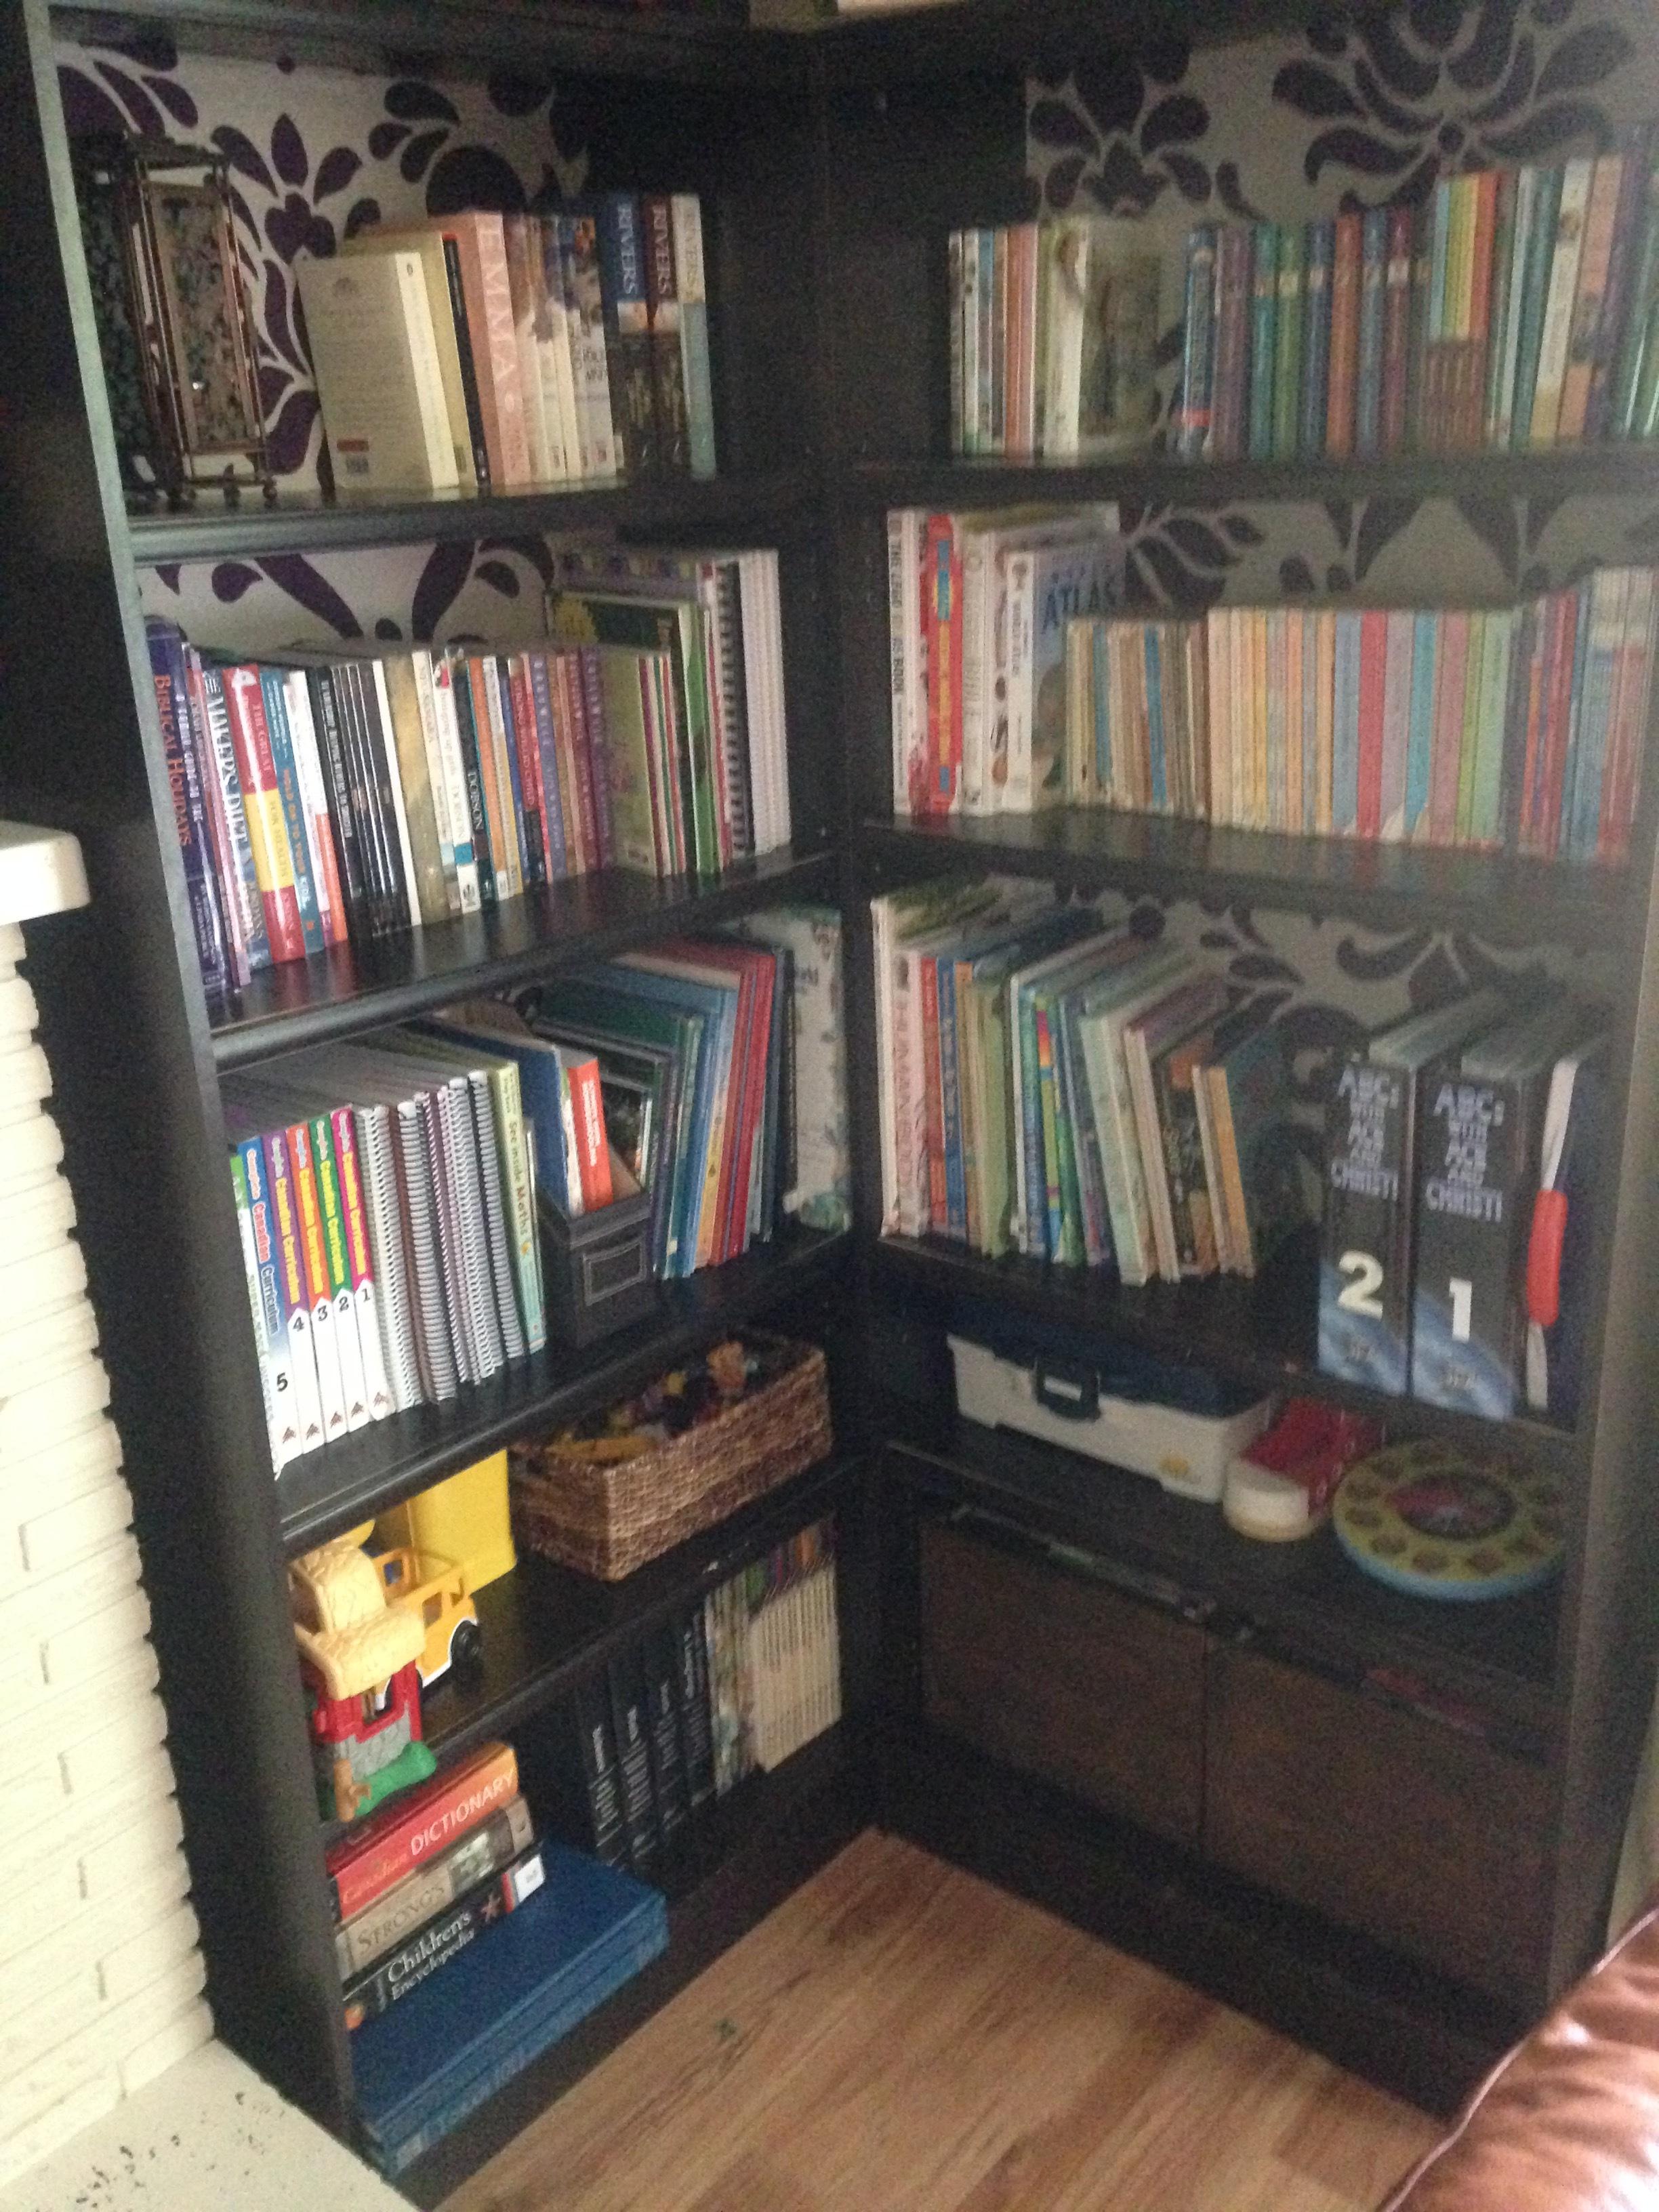 Organized Homeschool resources